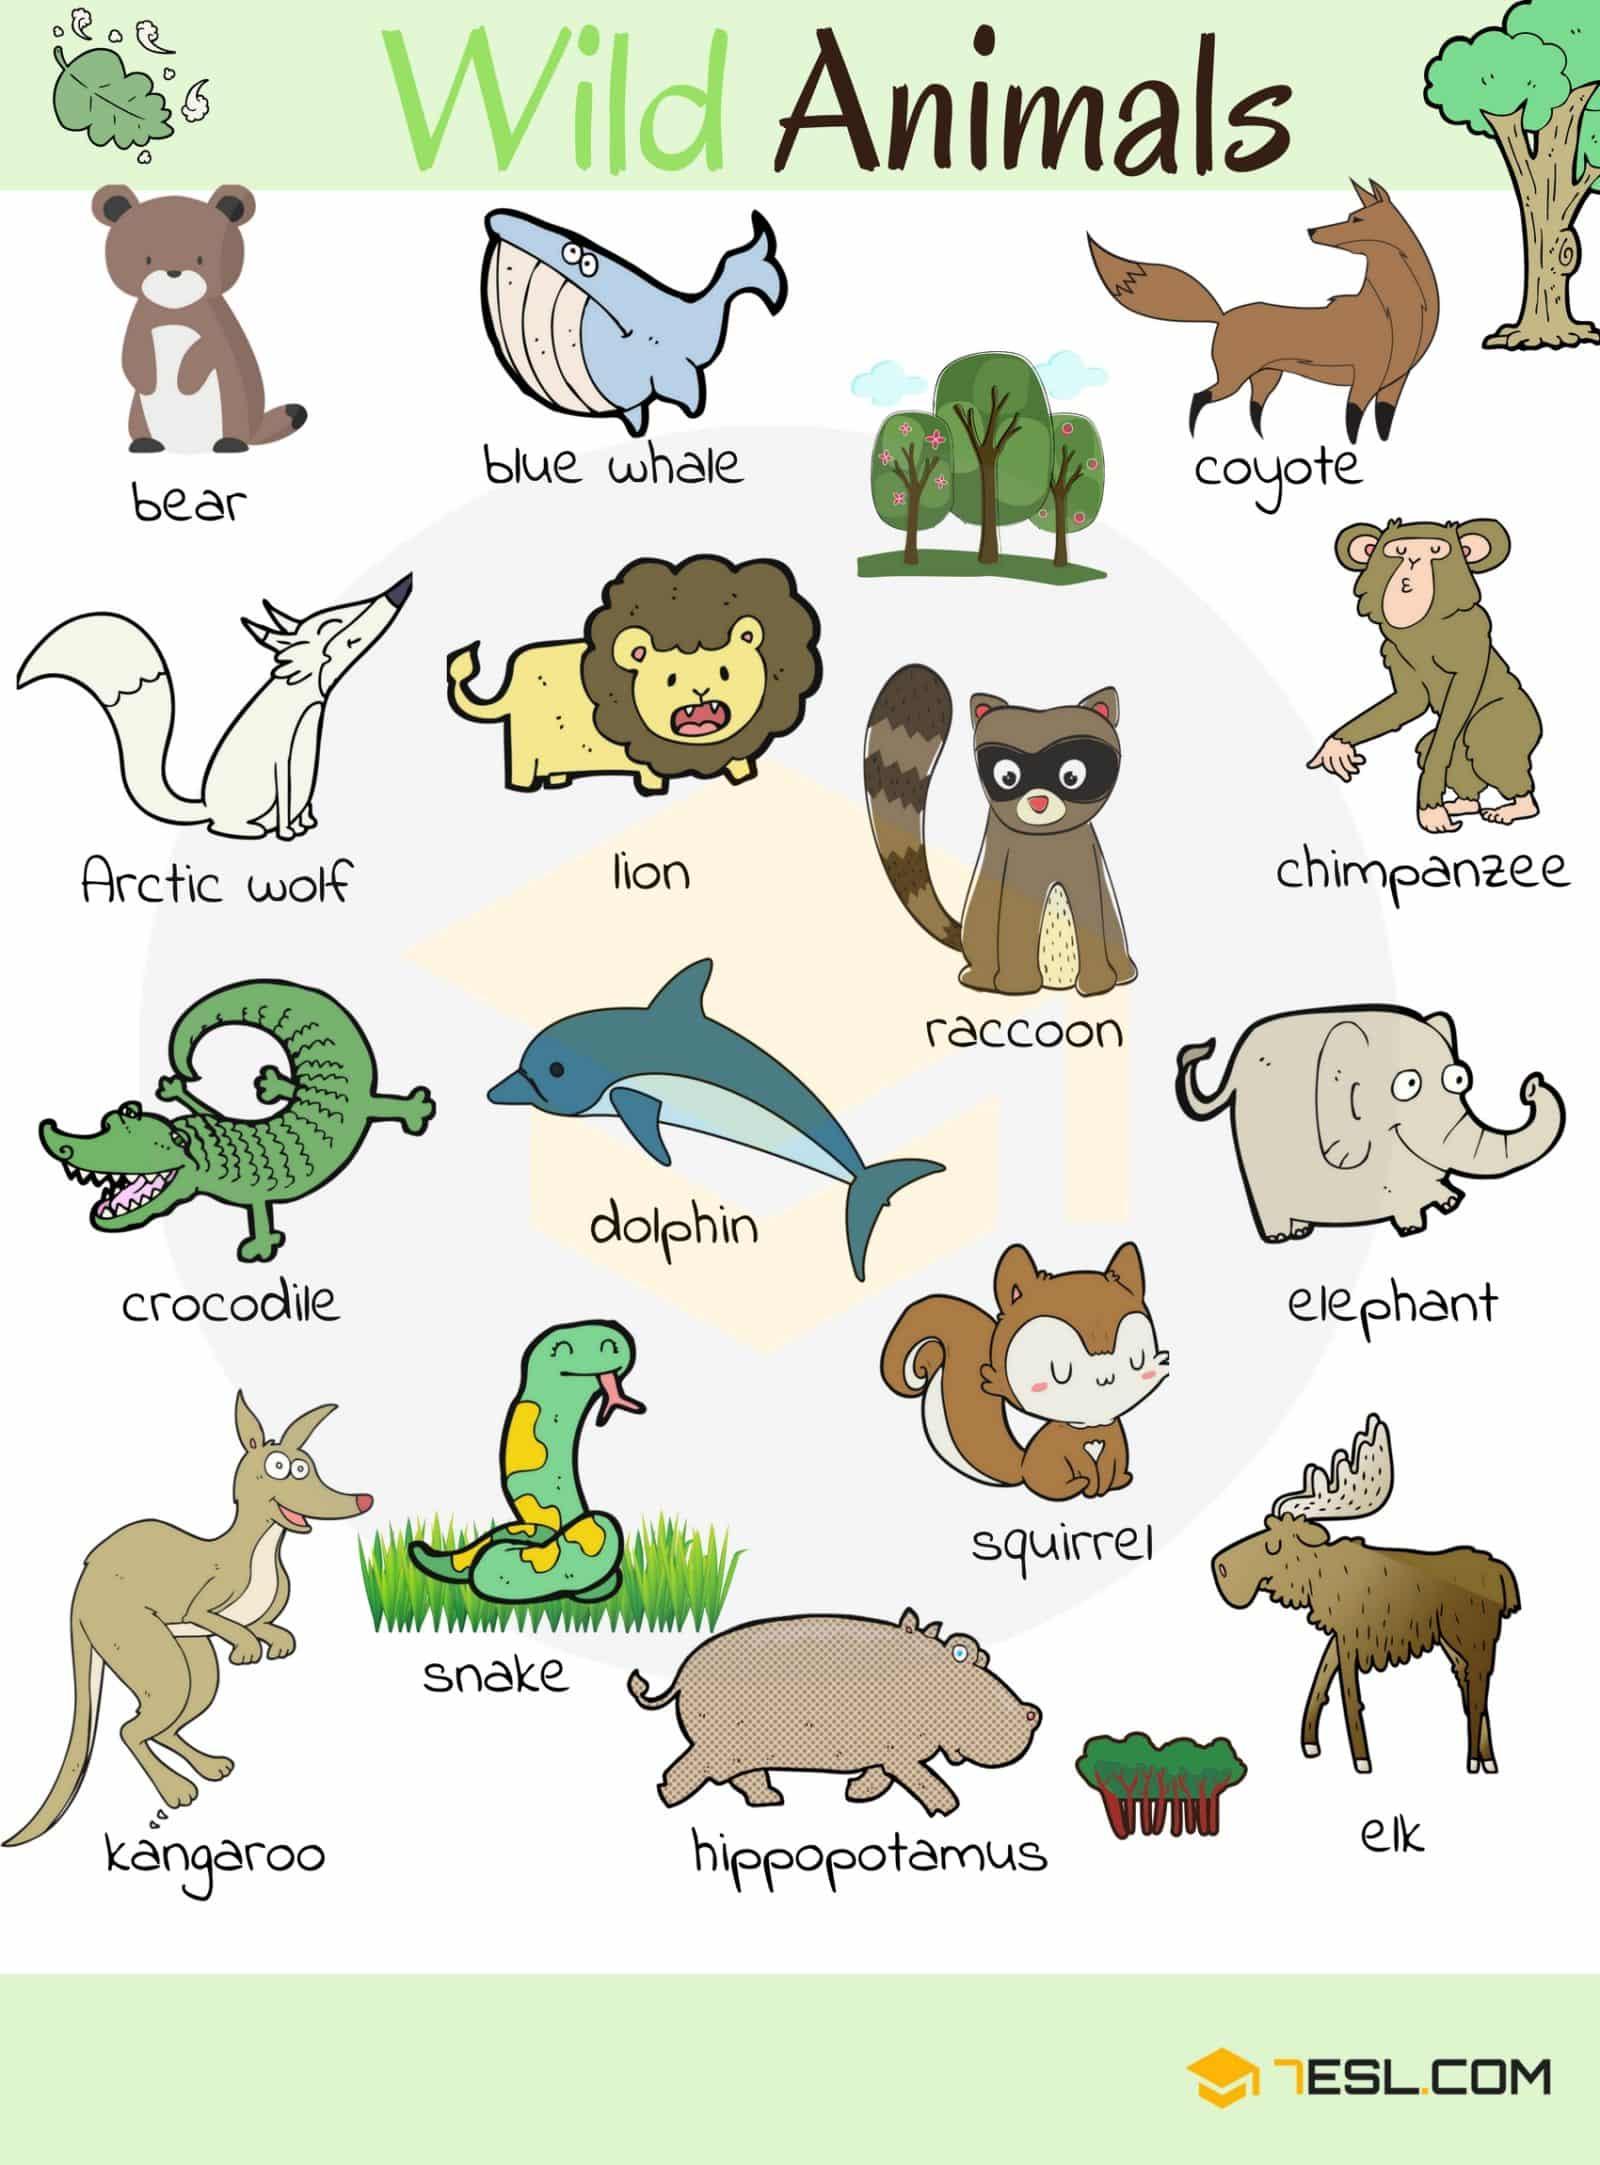 Wild Animal Vocabulary In English